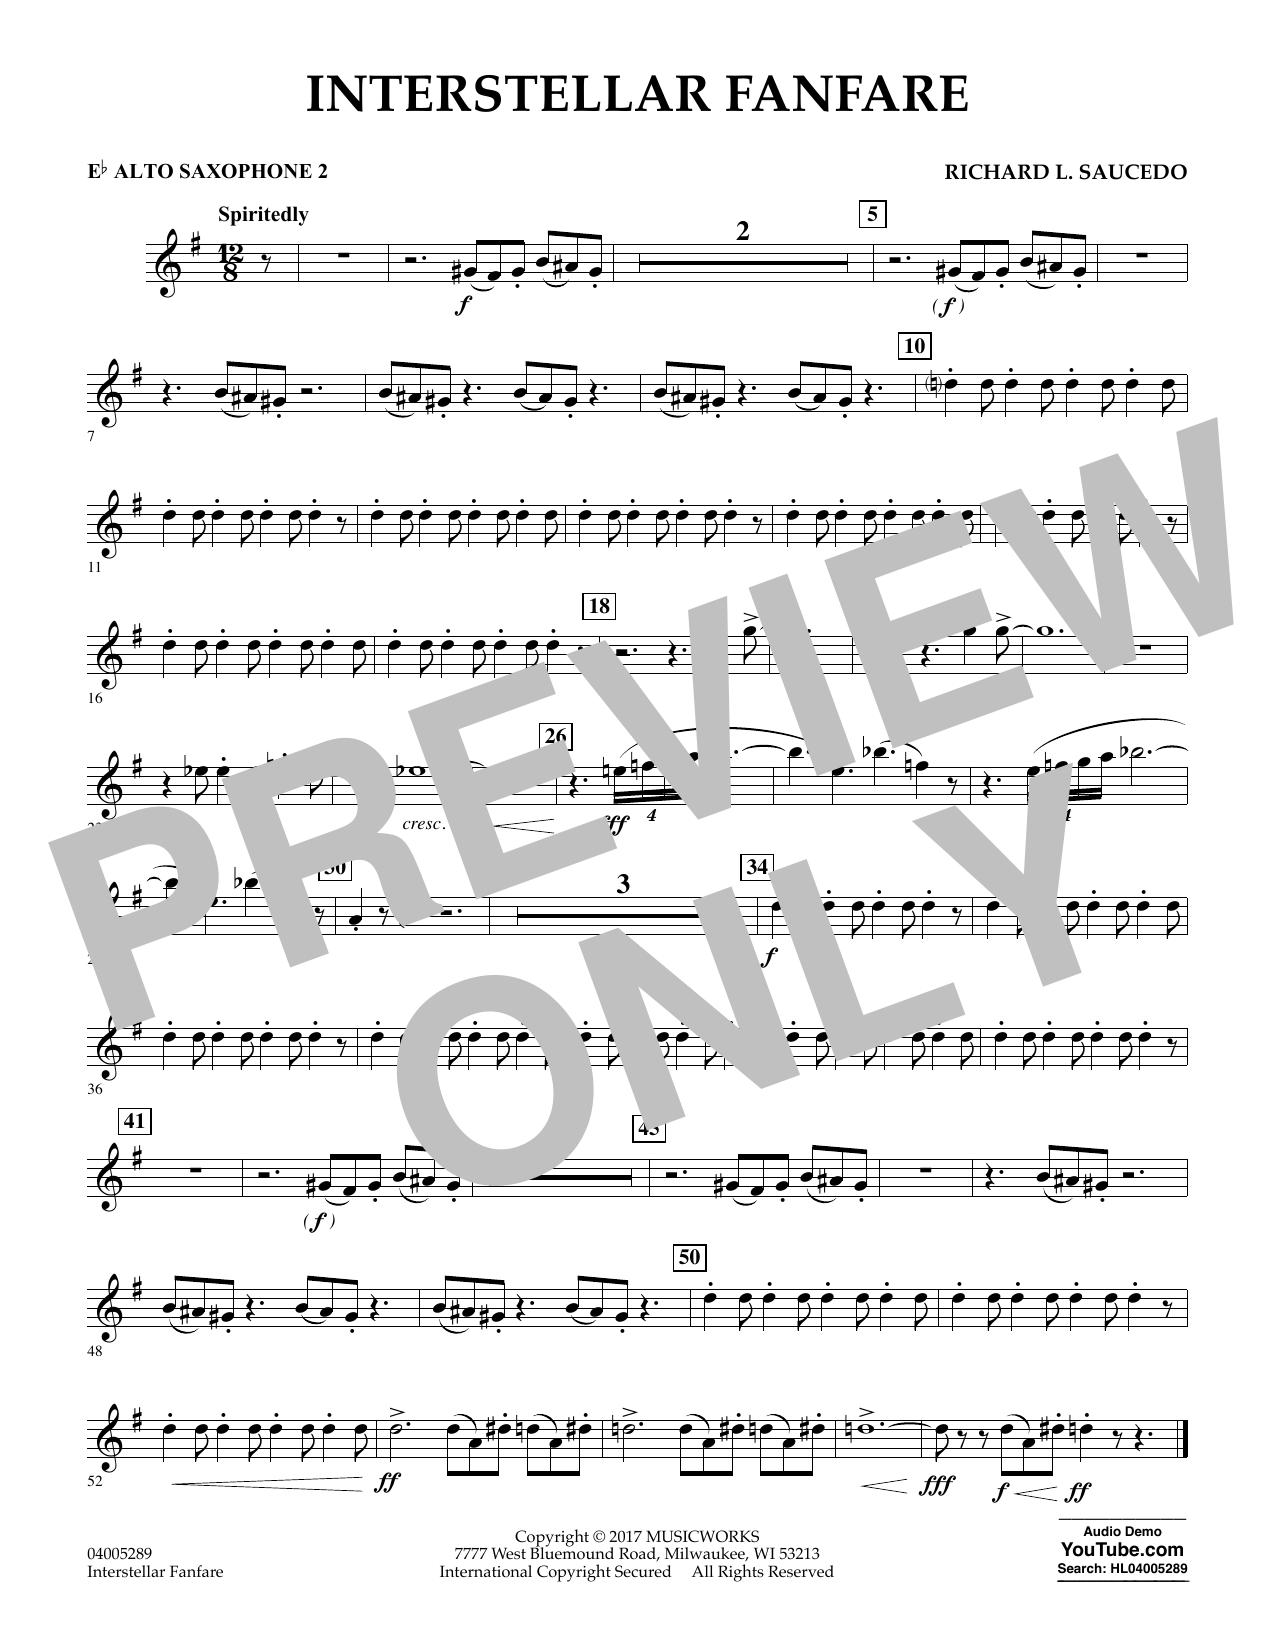 Richard L. Saucedo Interstellar Fanfare - Eb Alto Saxophone 2 sheet music notes printable PDF score